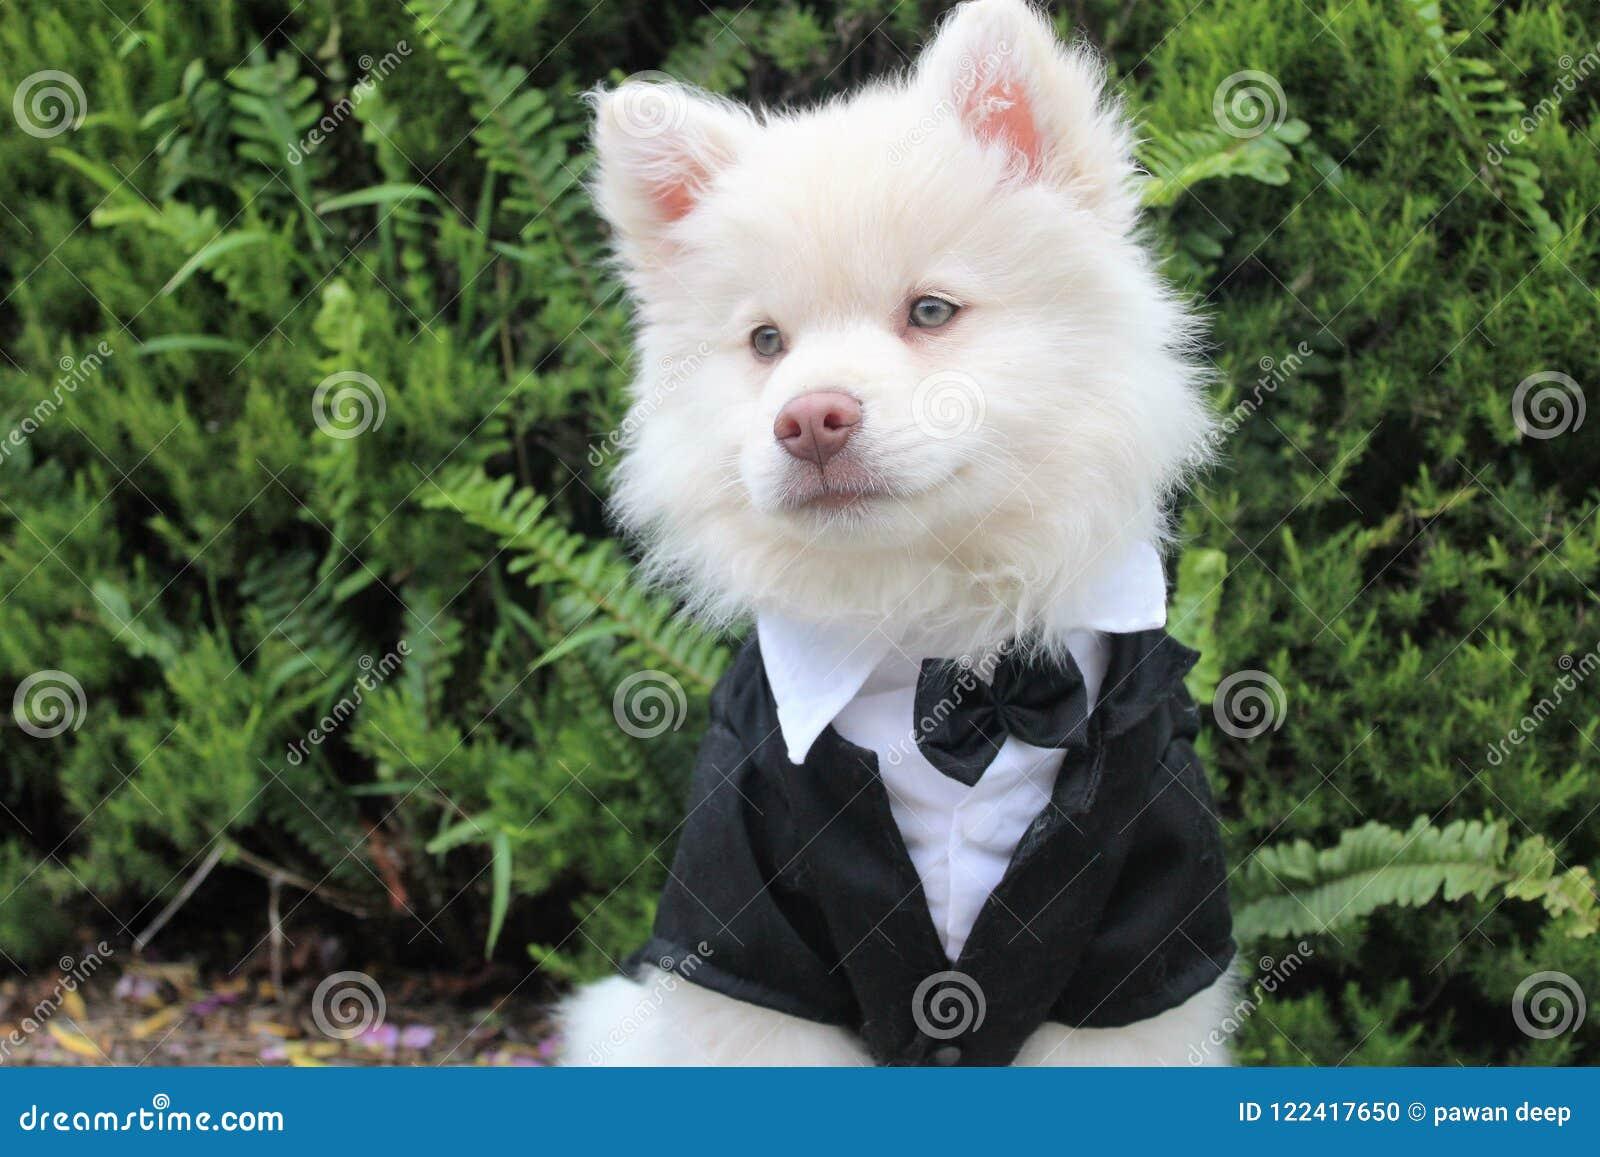 Cute Beautiful White Dog Stock Photo Image Of Very 122417650